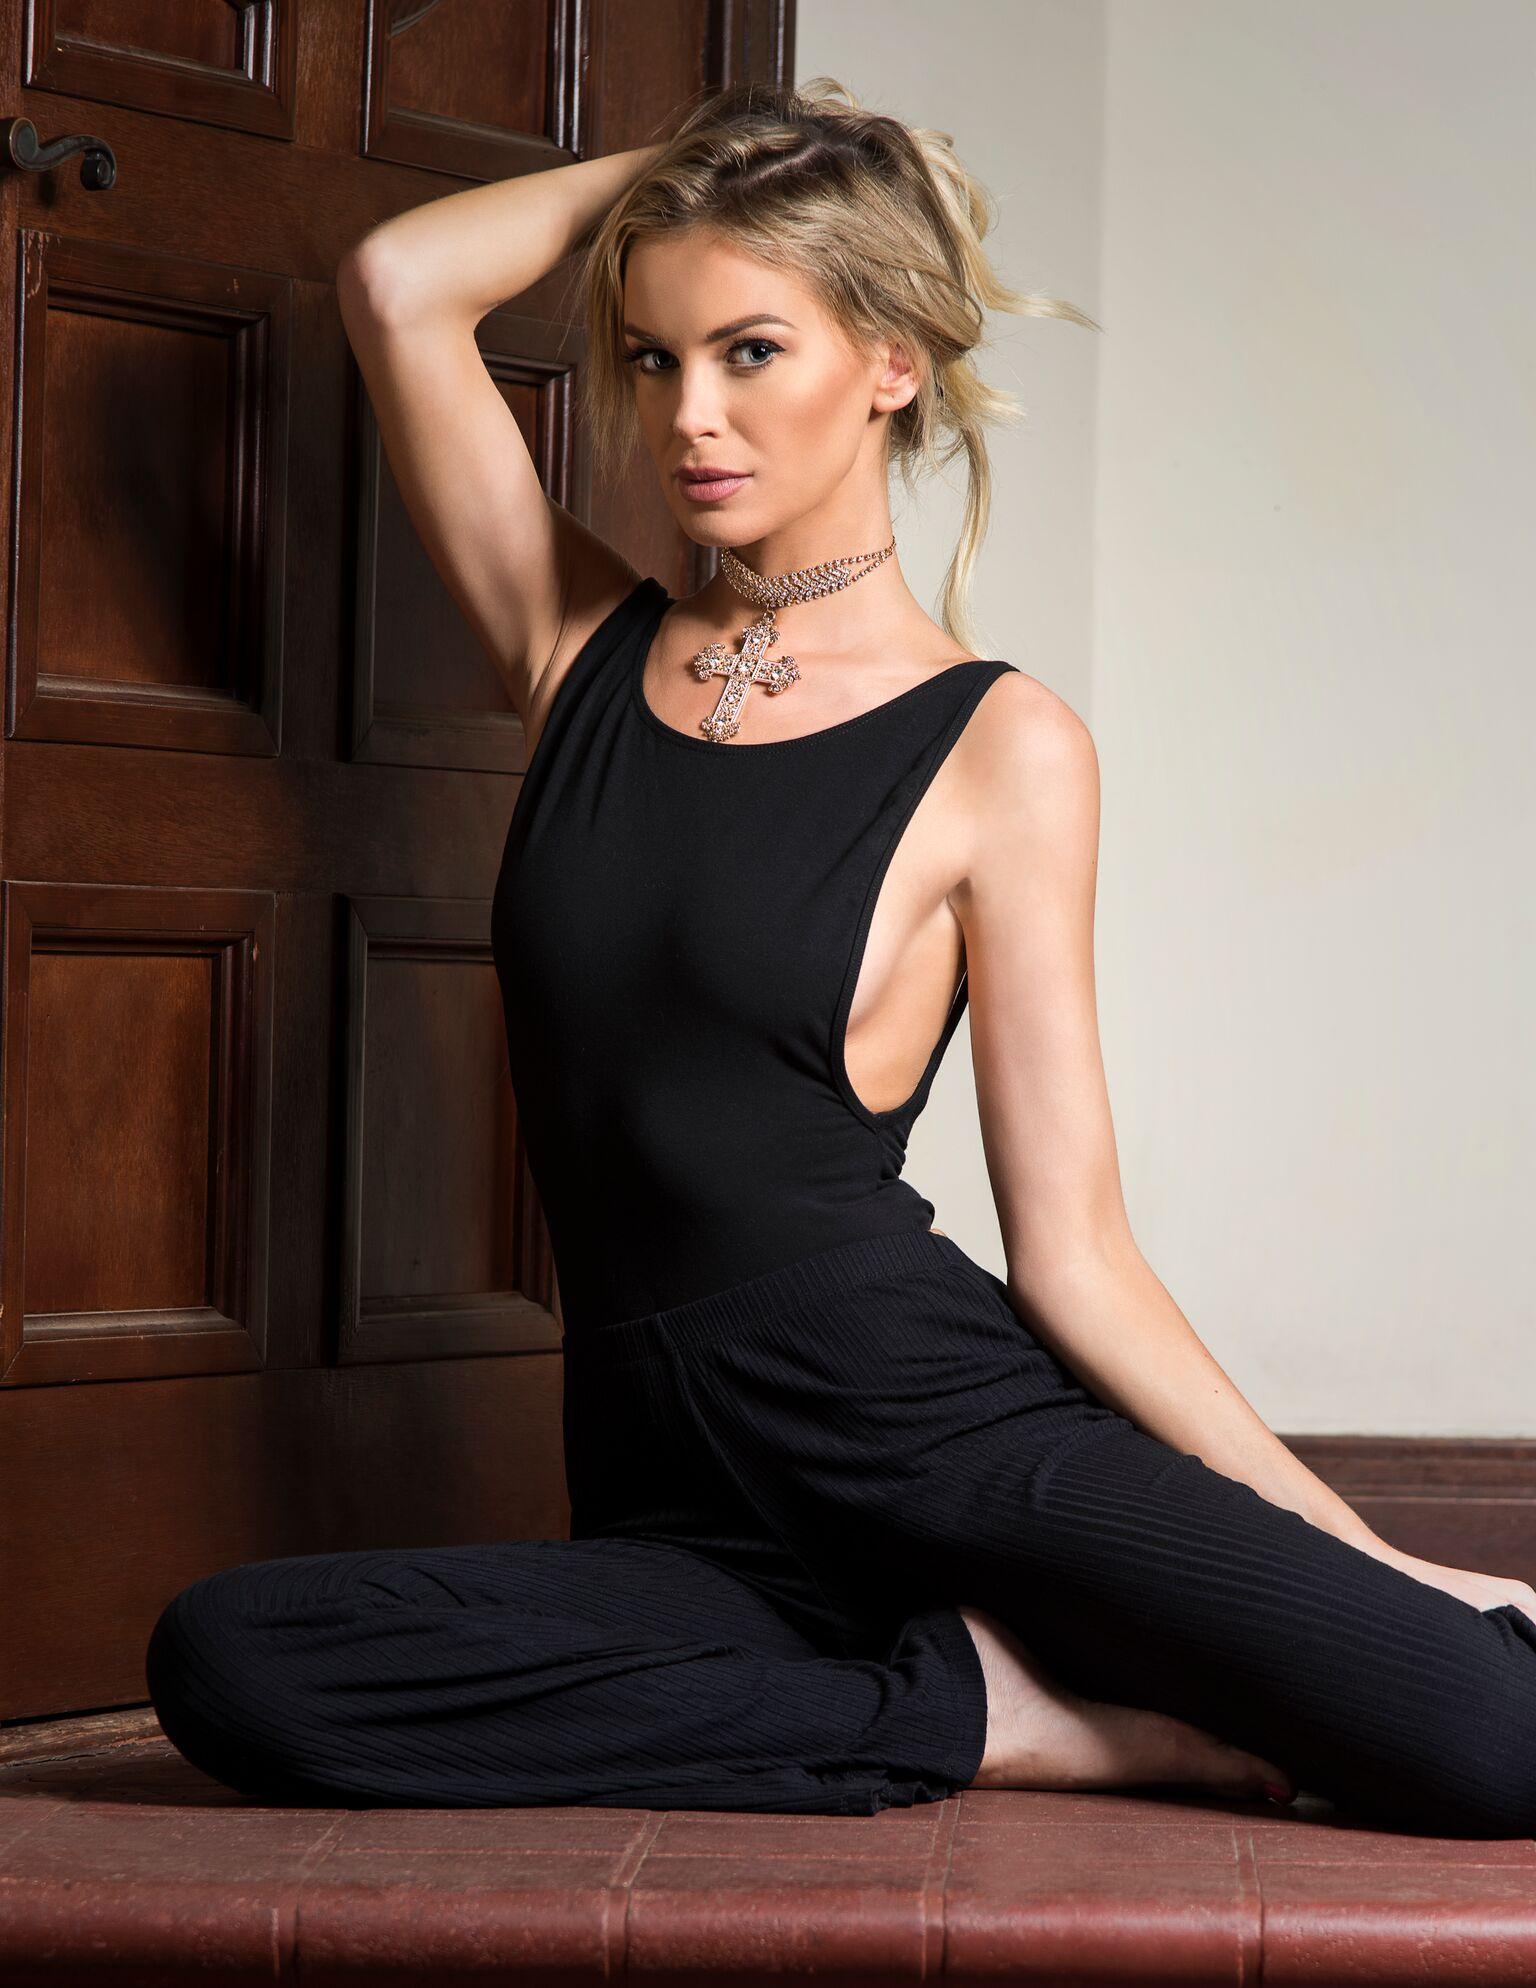 One Model Mission Katy Johnson